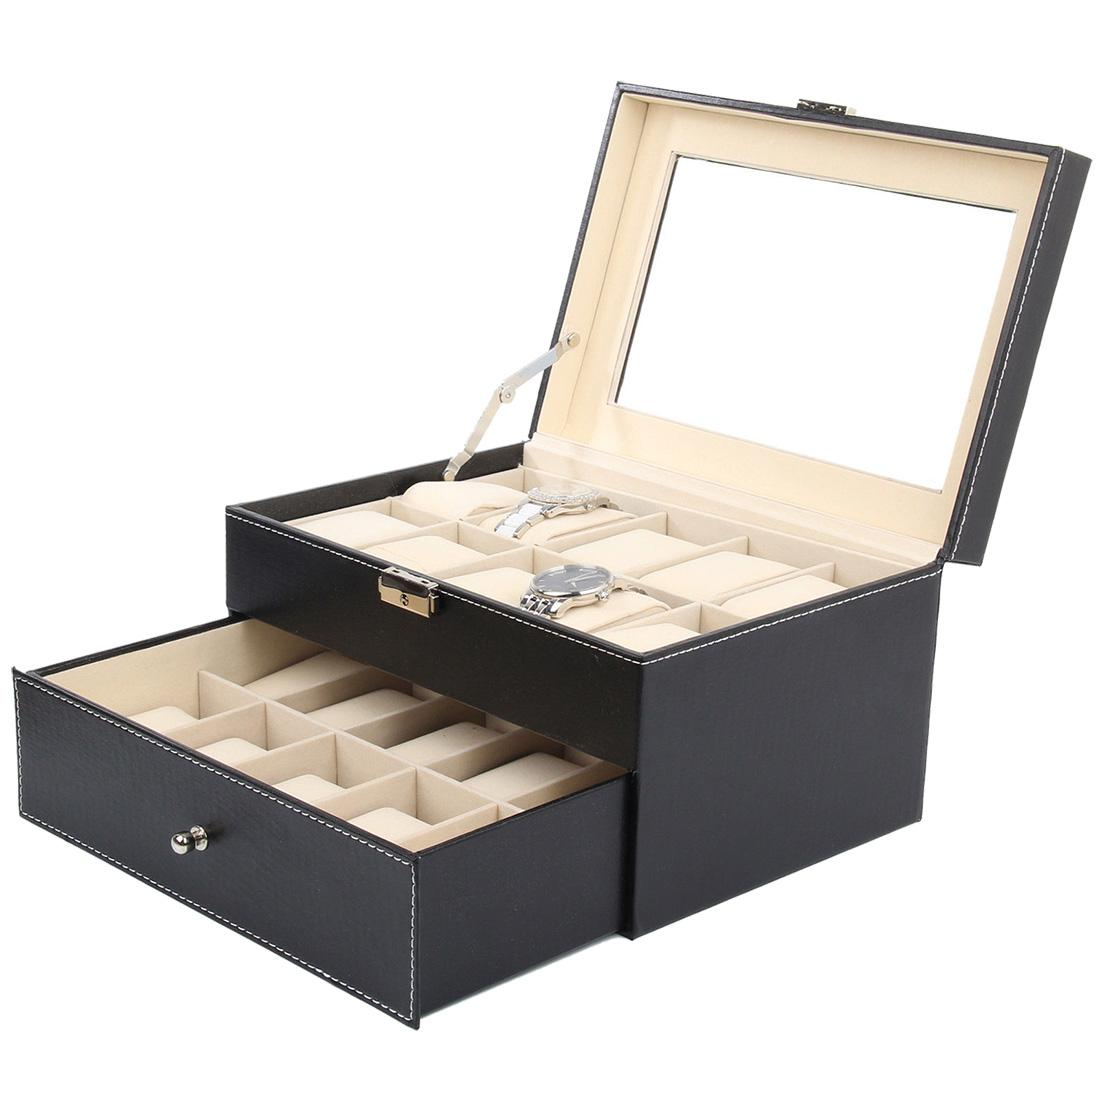 Faux Leather Watch Case Storage Display Box Organiser Jewelery Glass  TopMaterial U0026 Size:20 Grid Leather Storage Boxes U0026 Bins Cheap Storage Boxes  U0026 Bins Faux ...